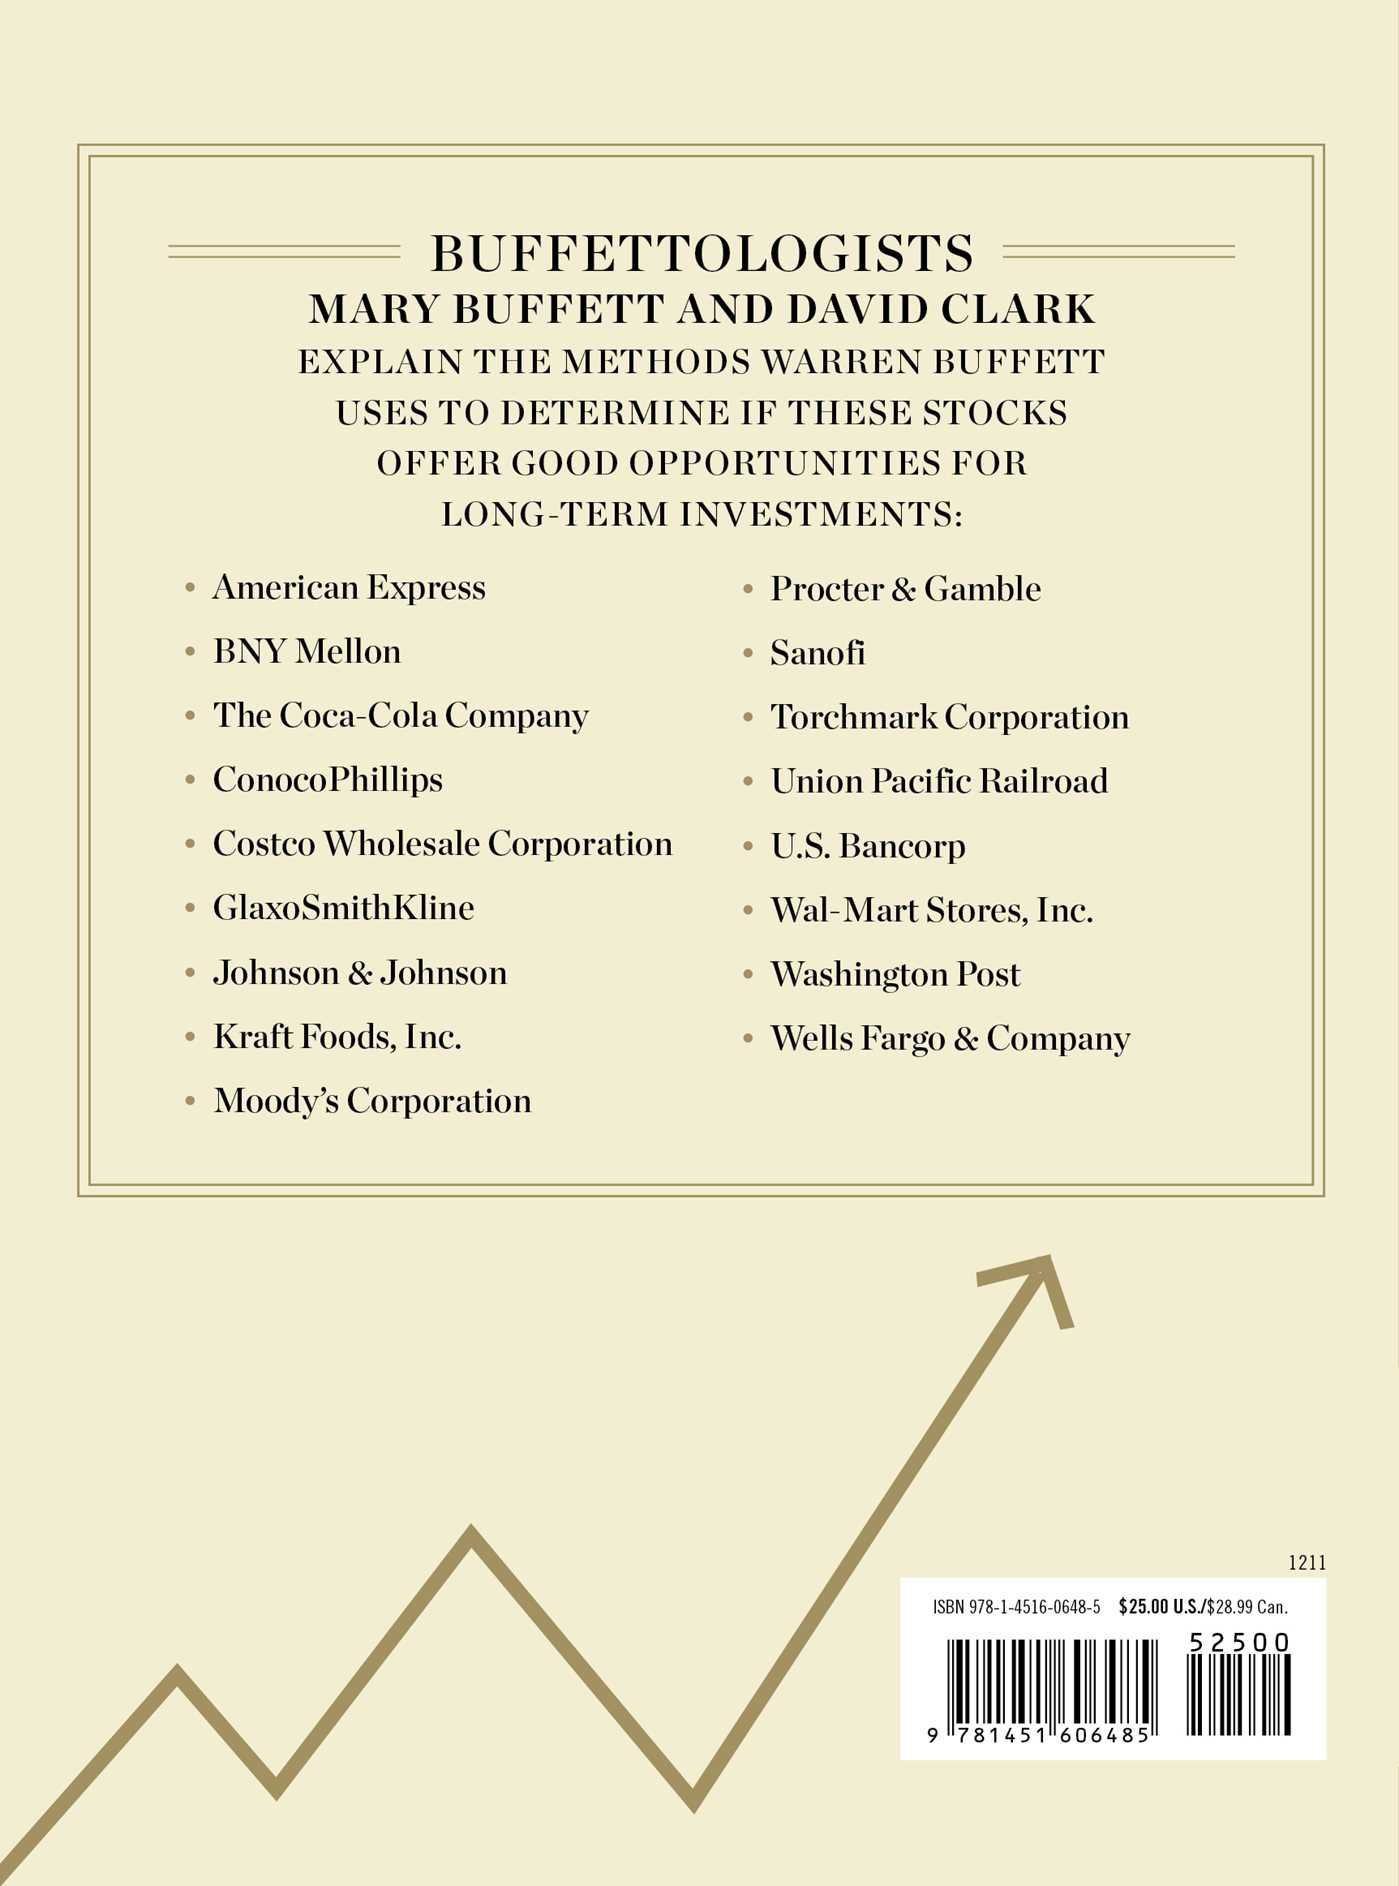 The warren buffett stock portfolio 9781451606485 hr back